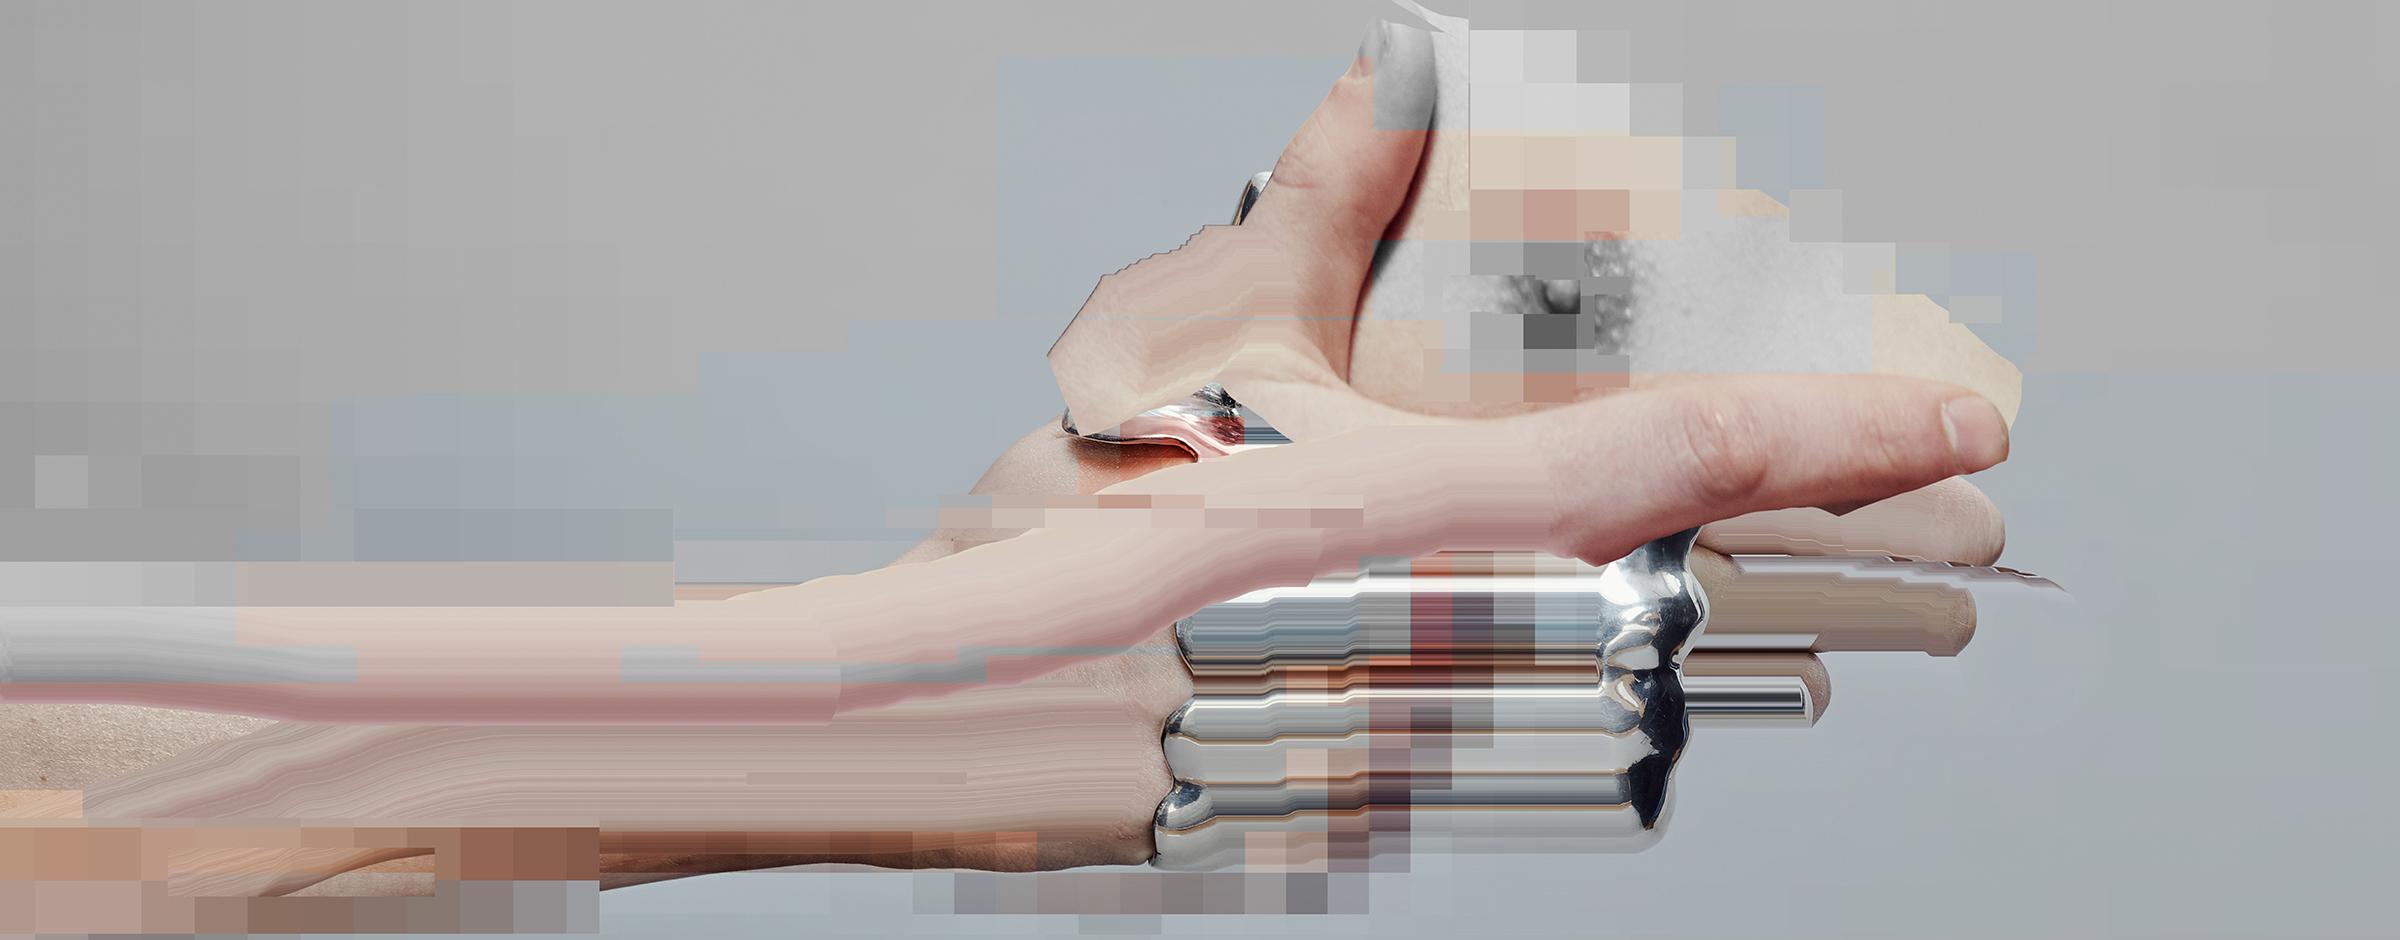 Pixelated hand